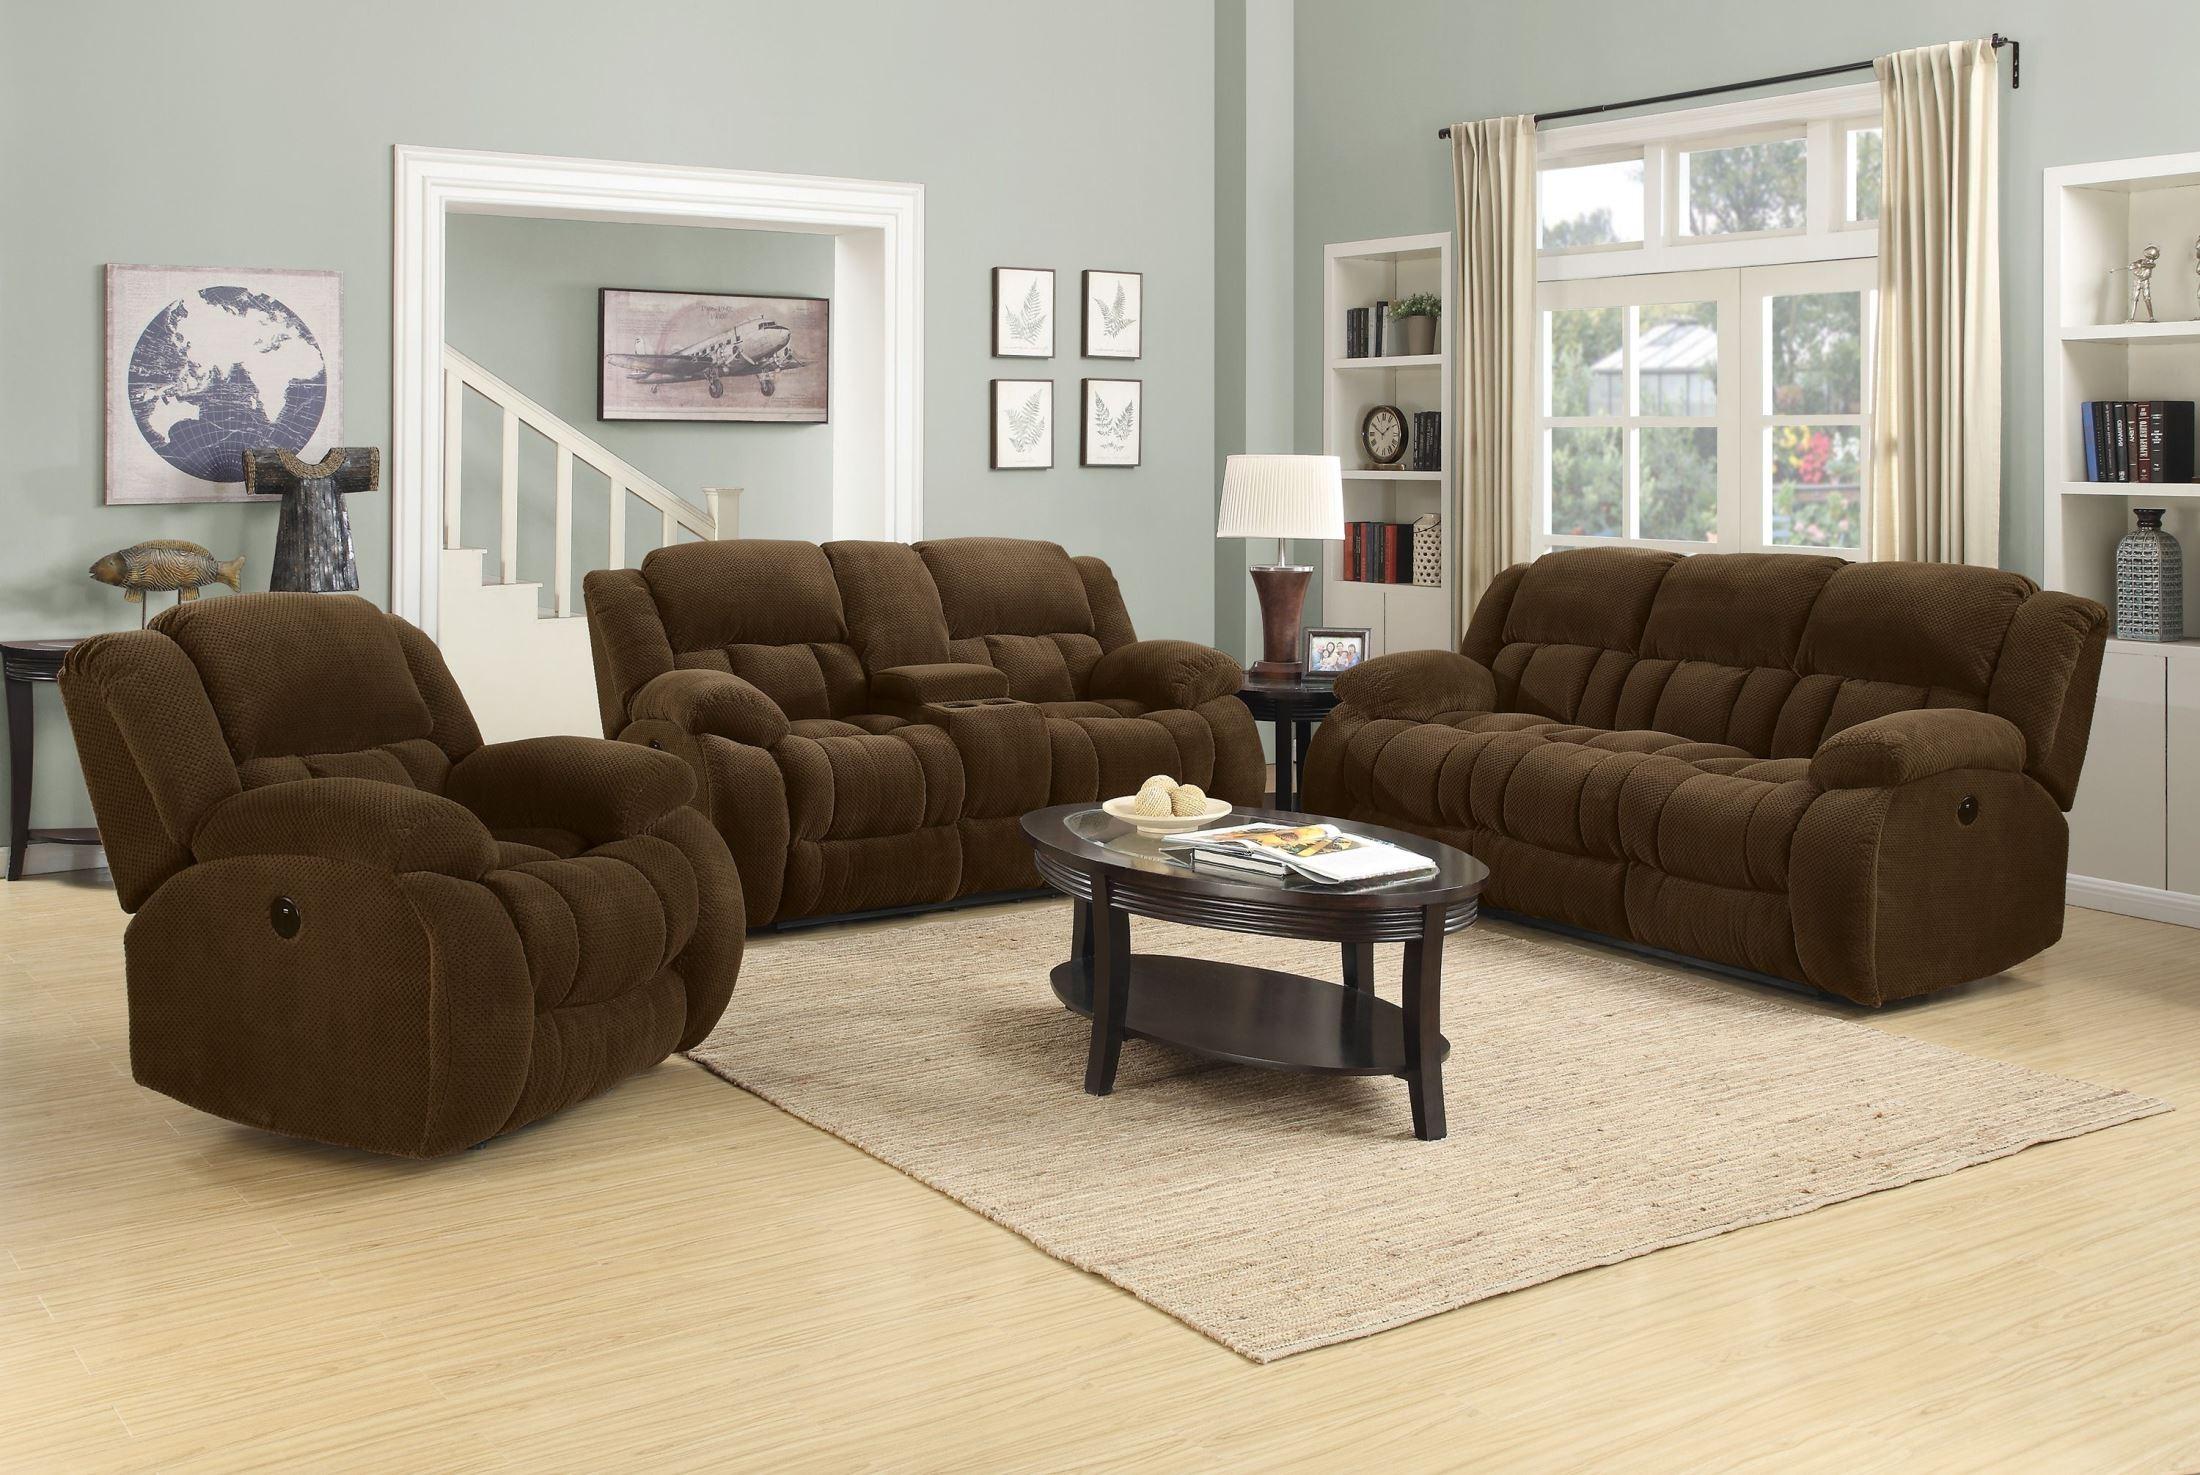 weissman brown reclining living room set from coaster 601924